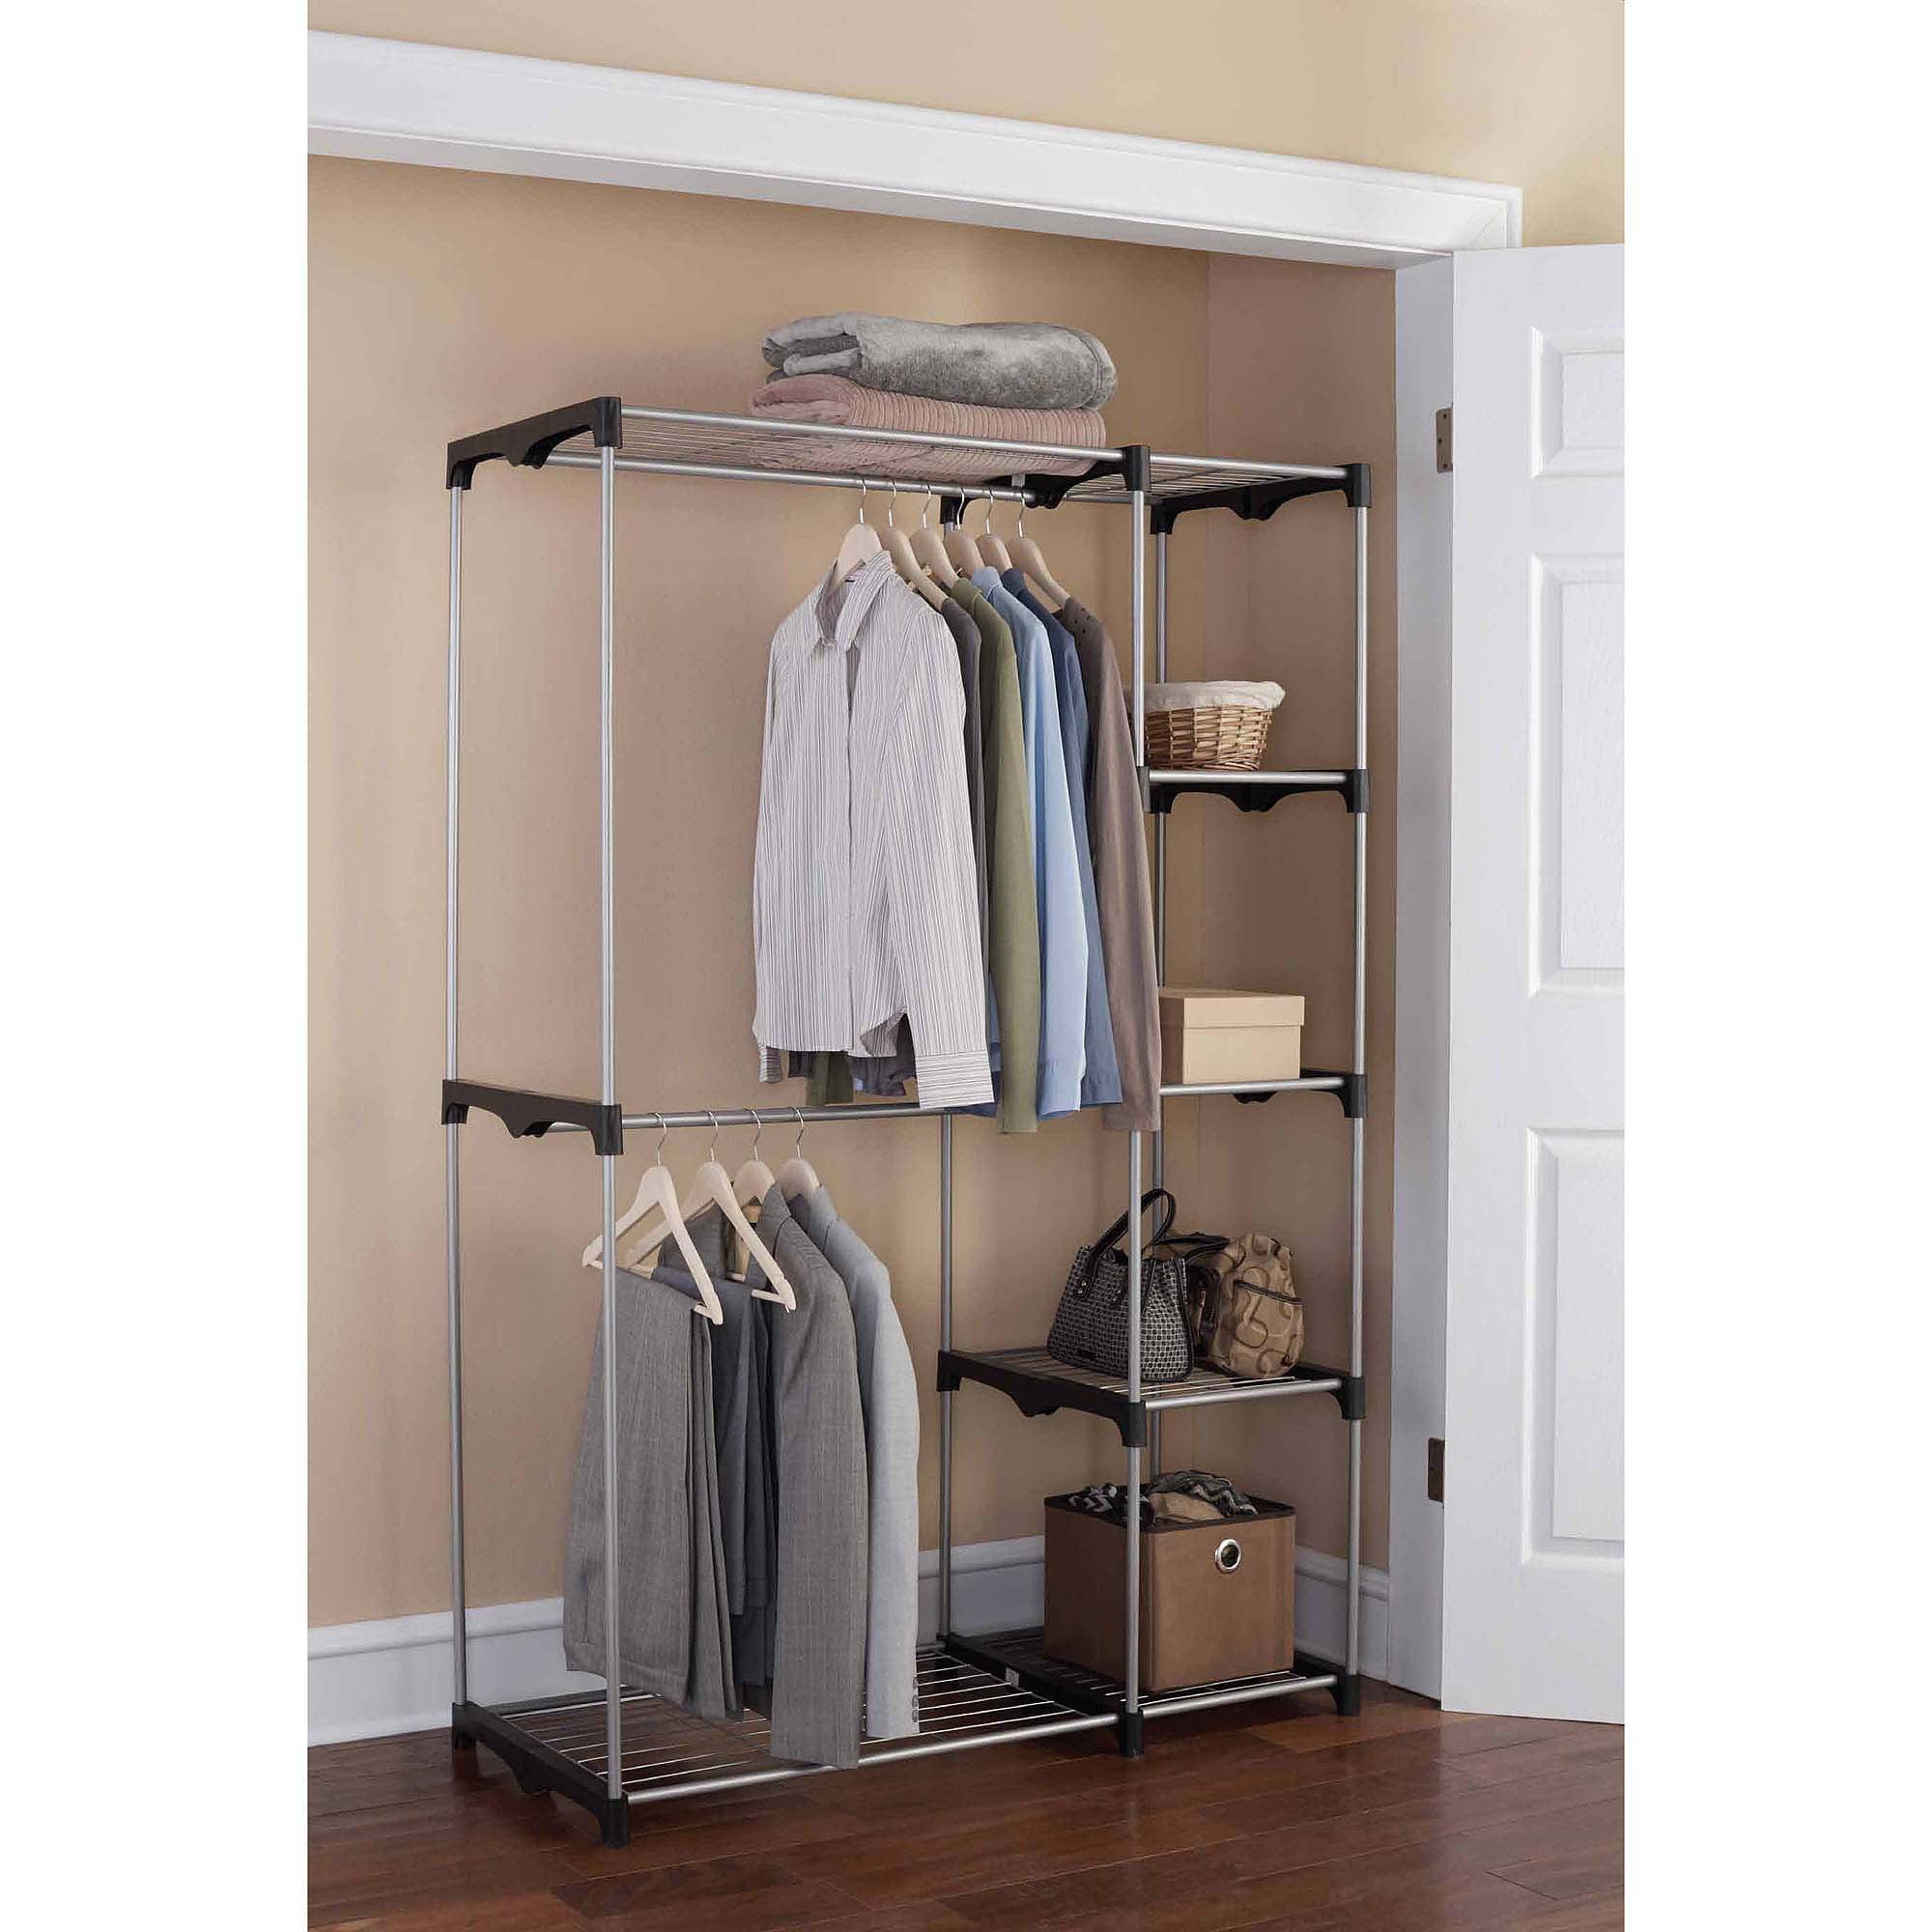 Mainstays wire shelf closet organizer black silver